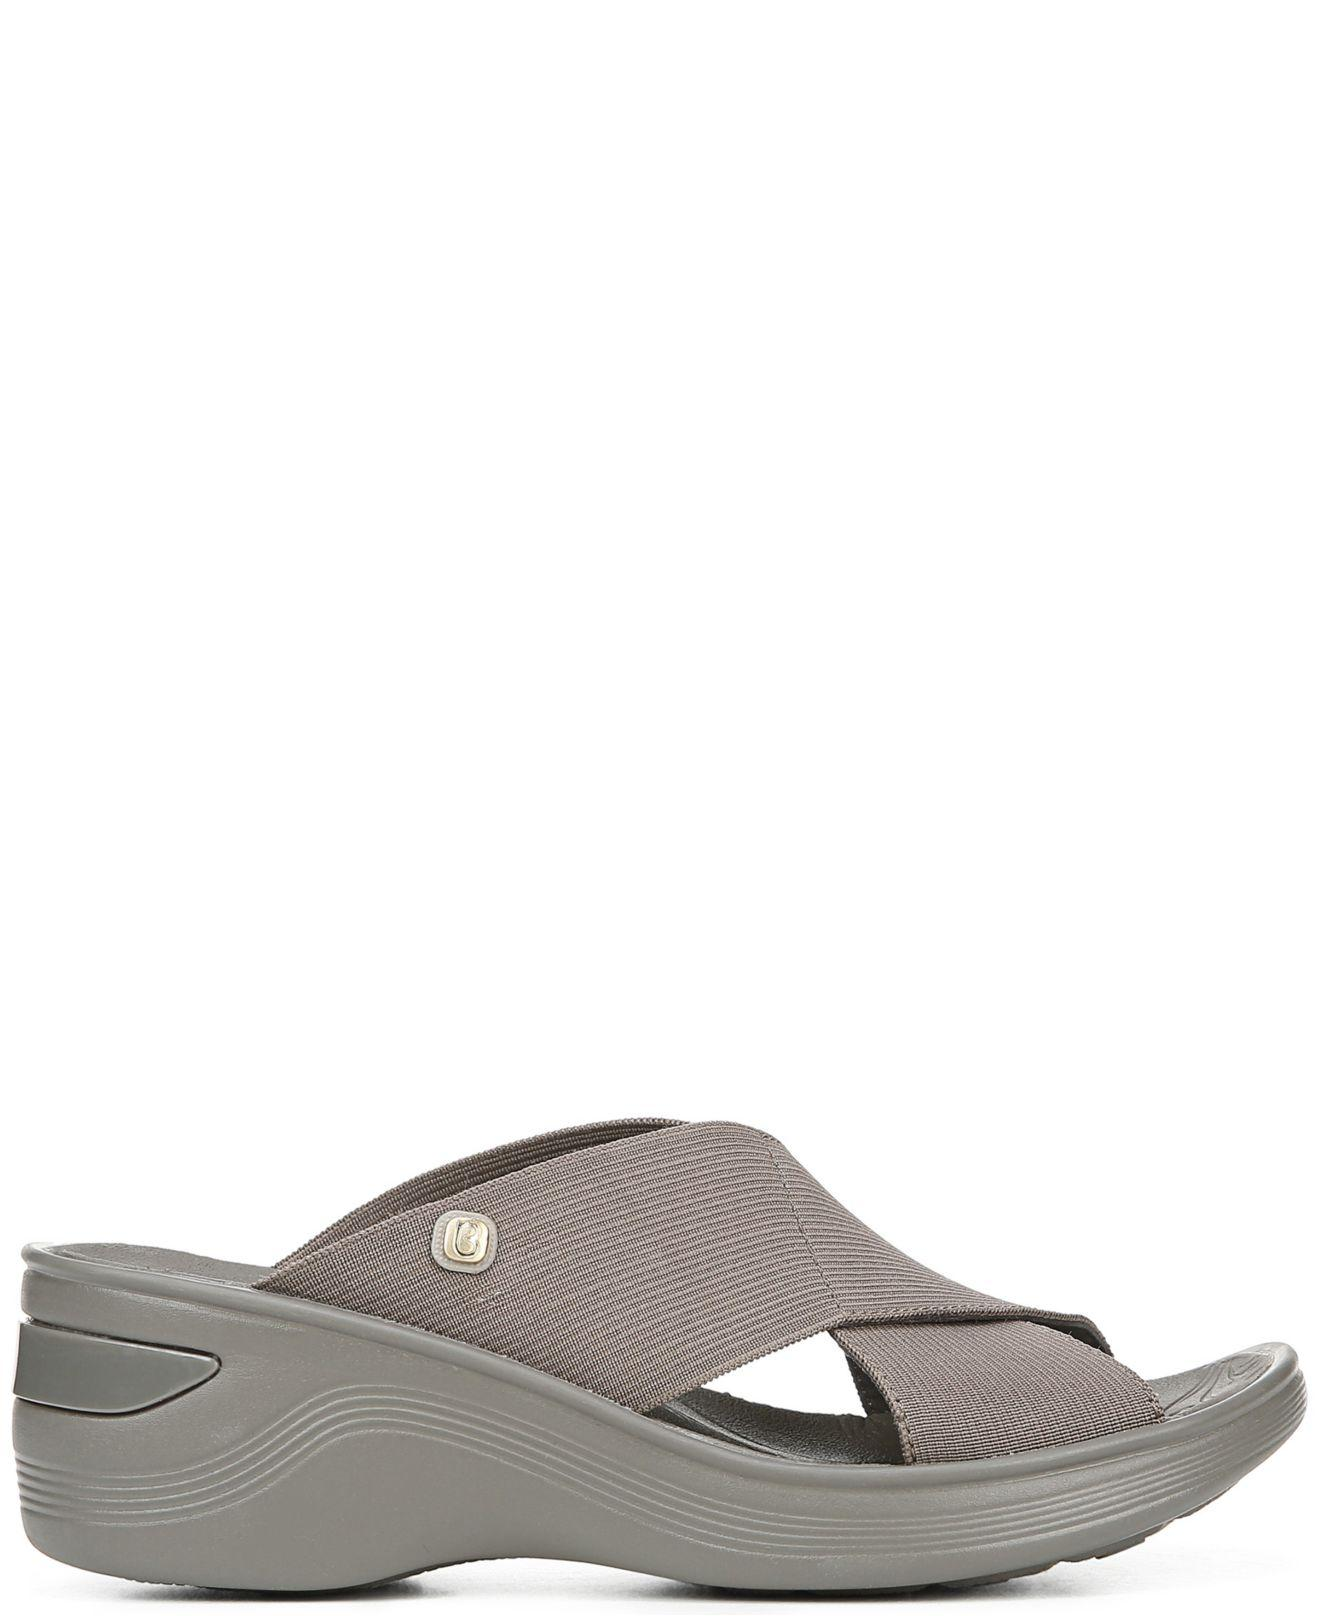 ddb2e7f69e0 Lyst - Bzees Desire Sandals in Brown